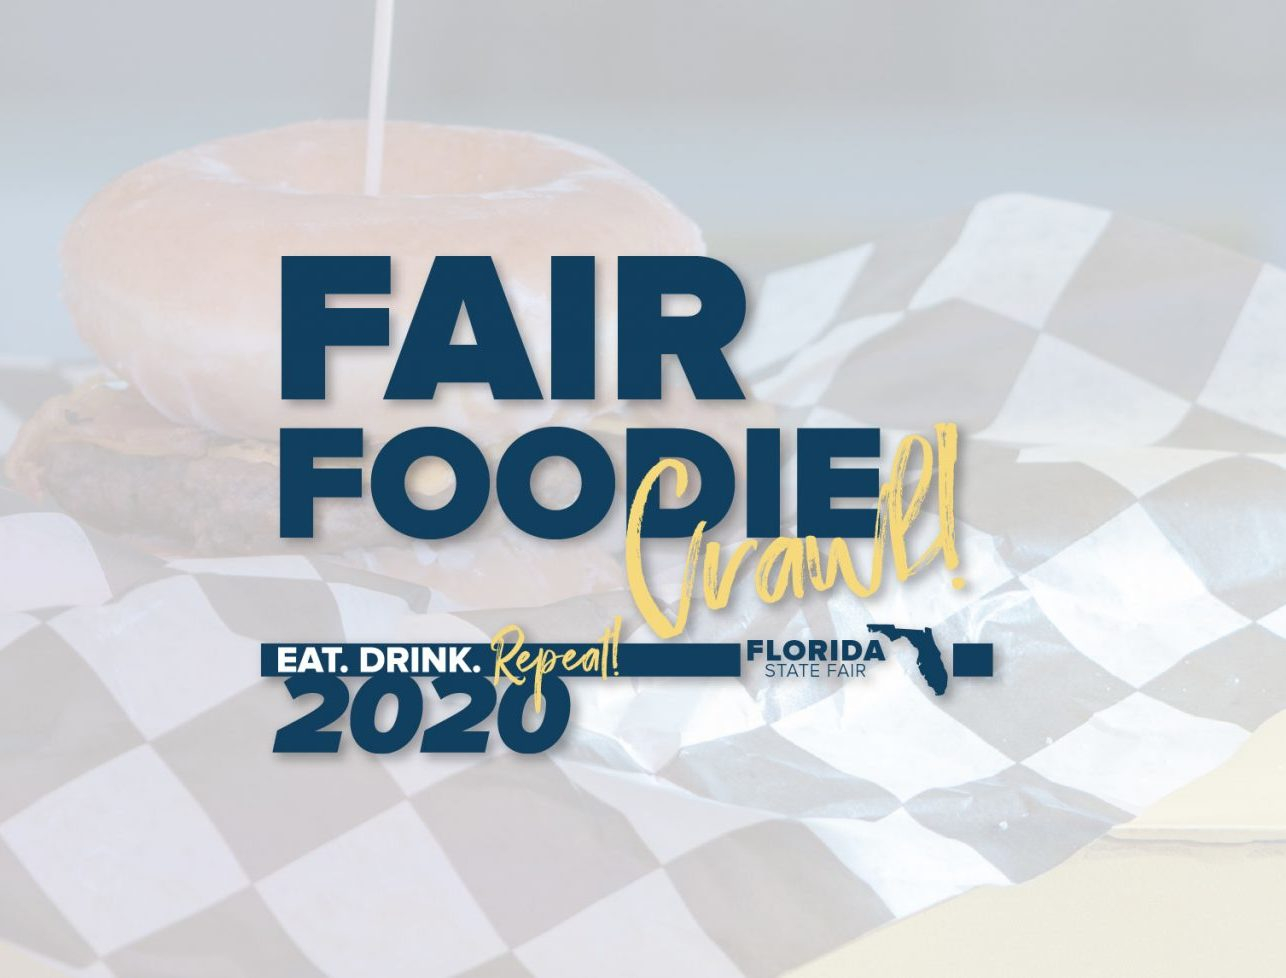 Fair Foodie Crawl - Florida State Fair With Regard To Florida State Fairgrounds Calendar Of Events